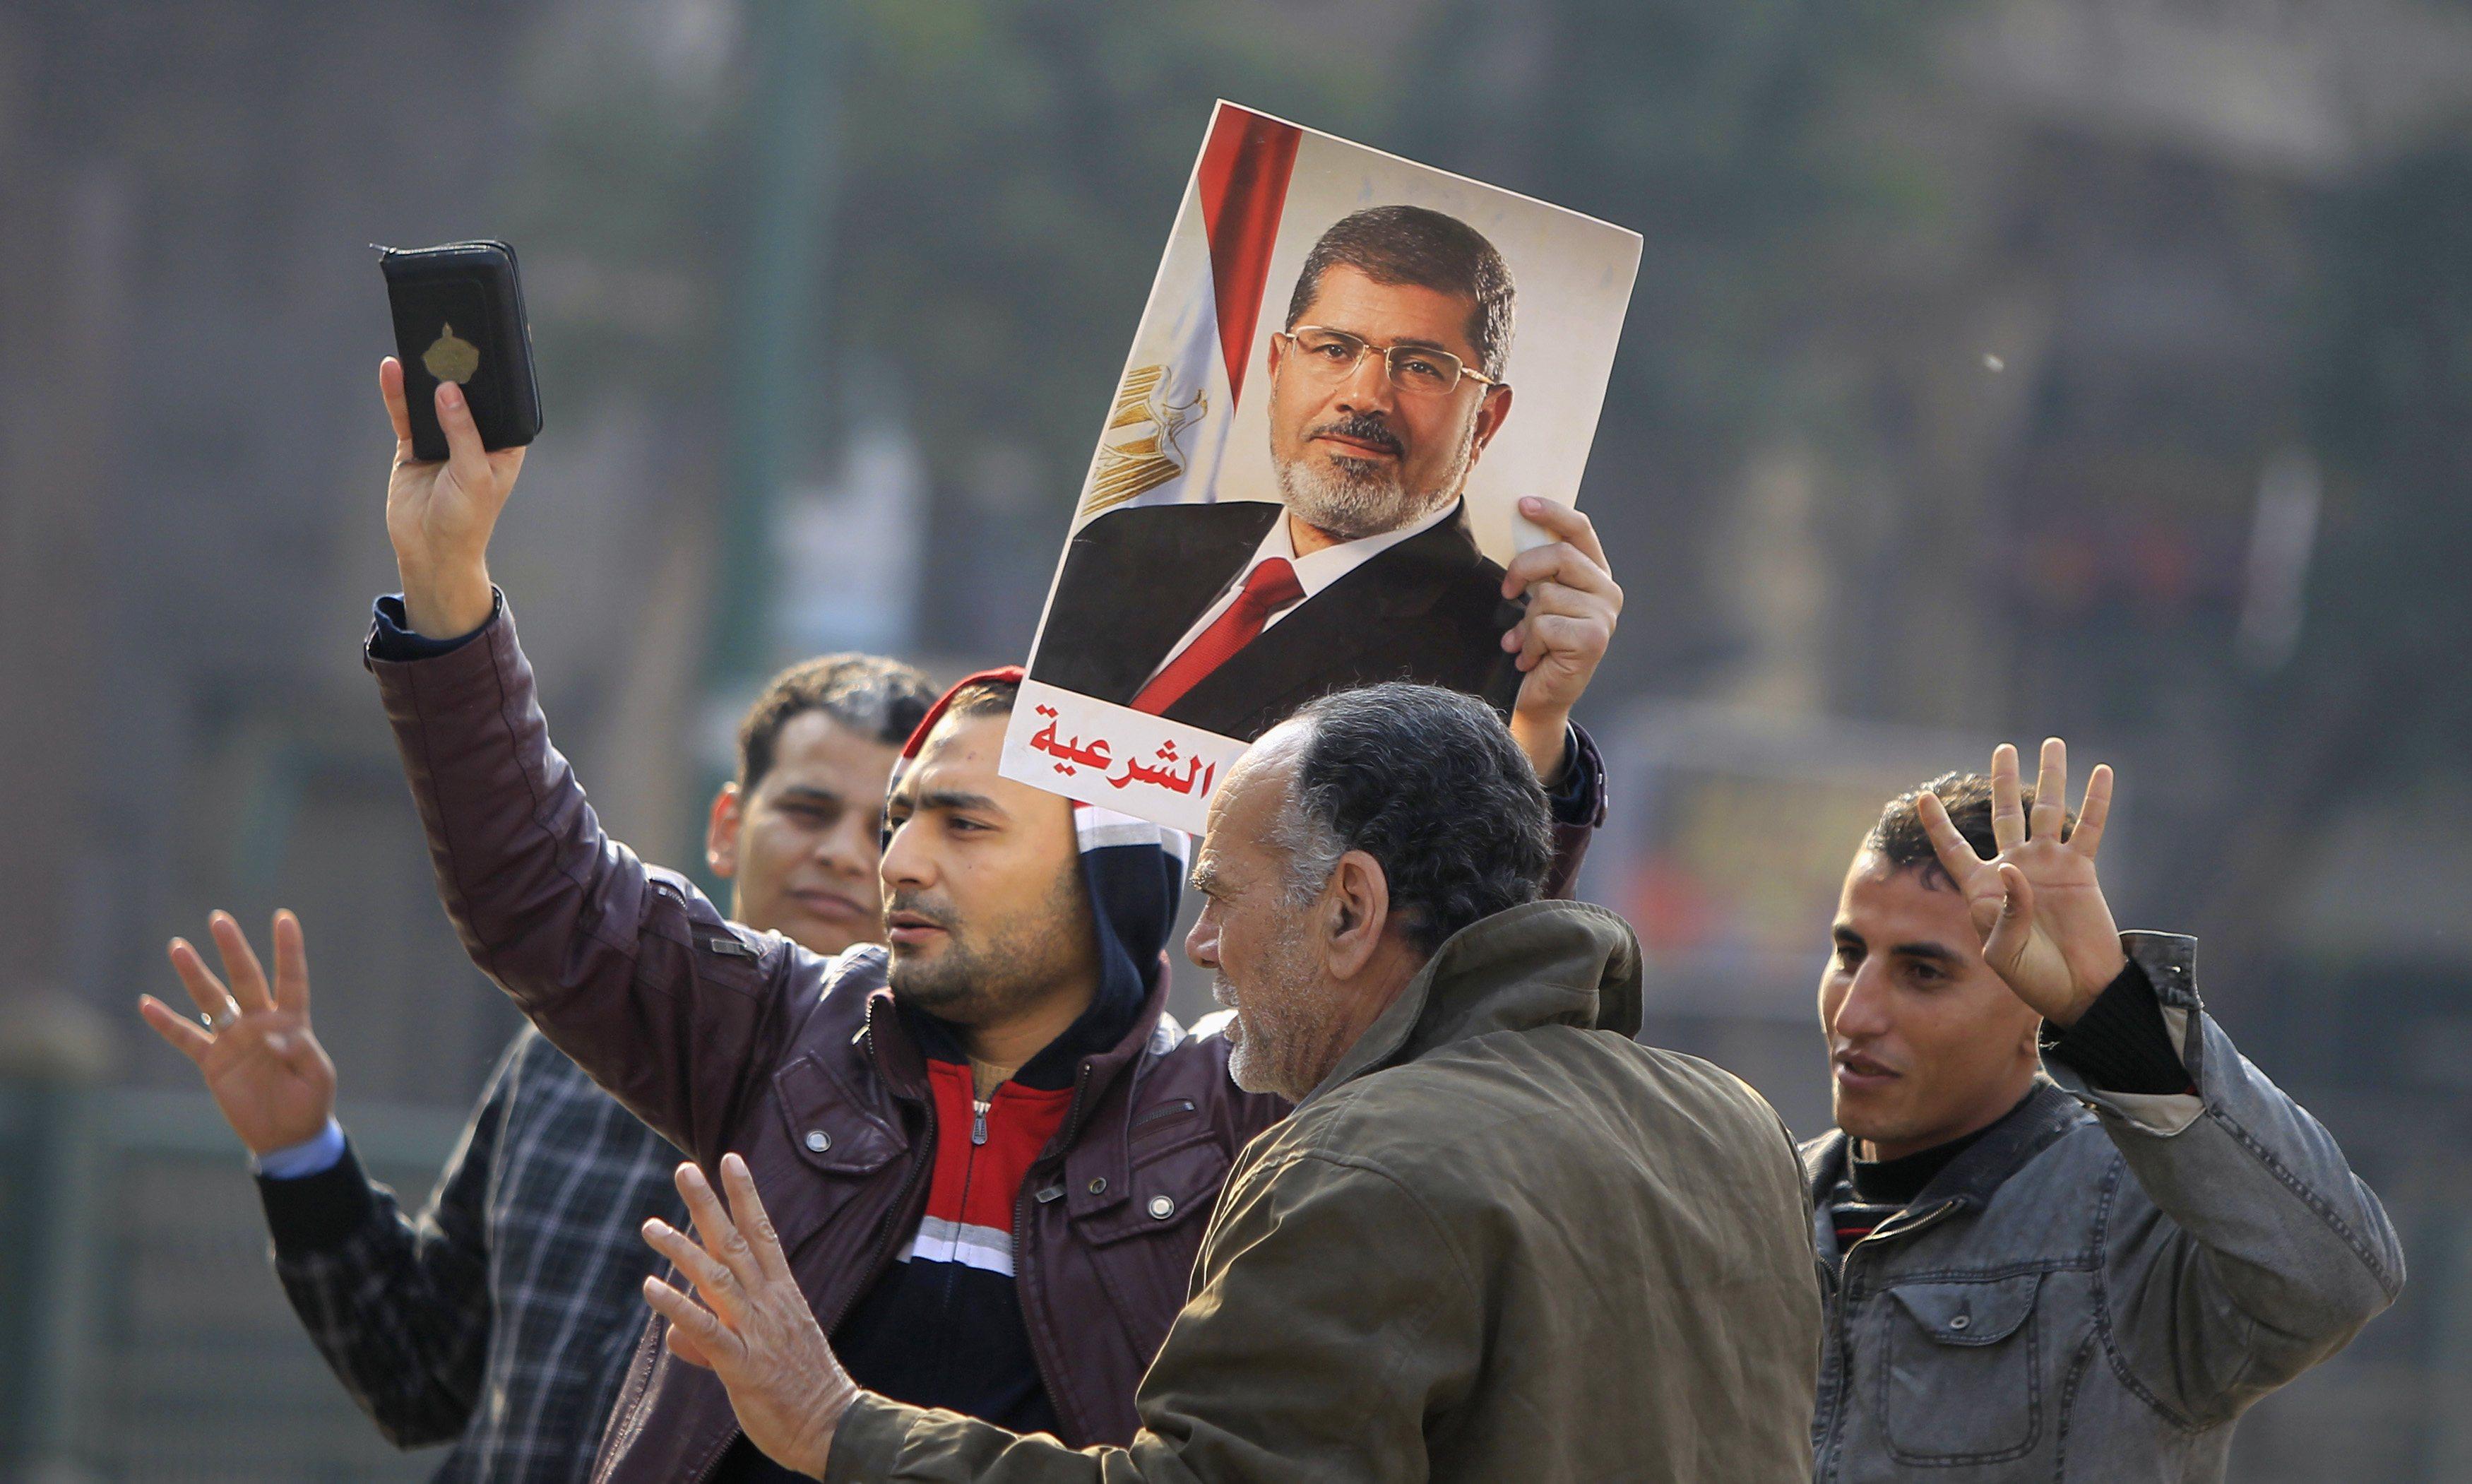 516 Brotherhood affiliates arrested on uprising anniversary - Interior Minister